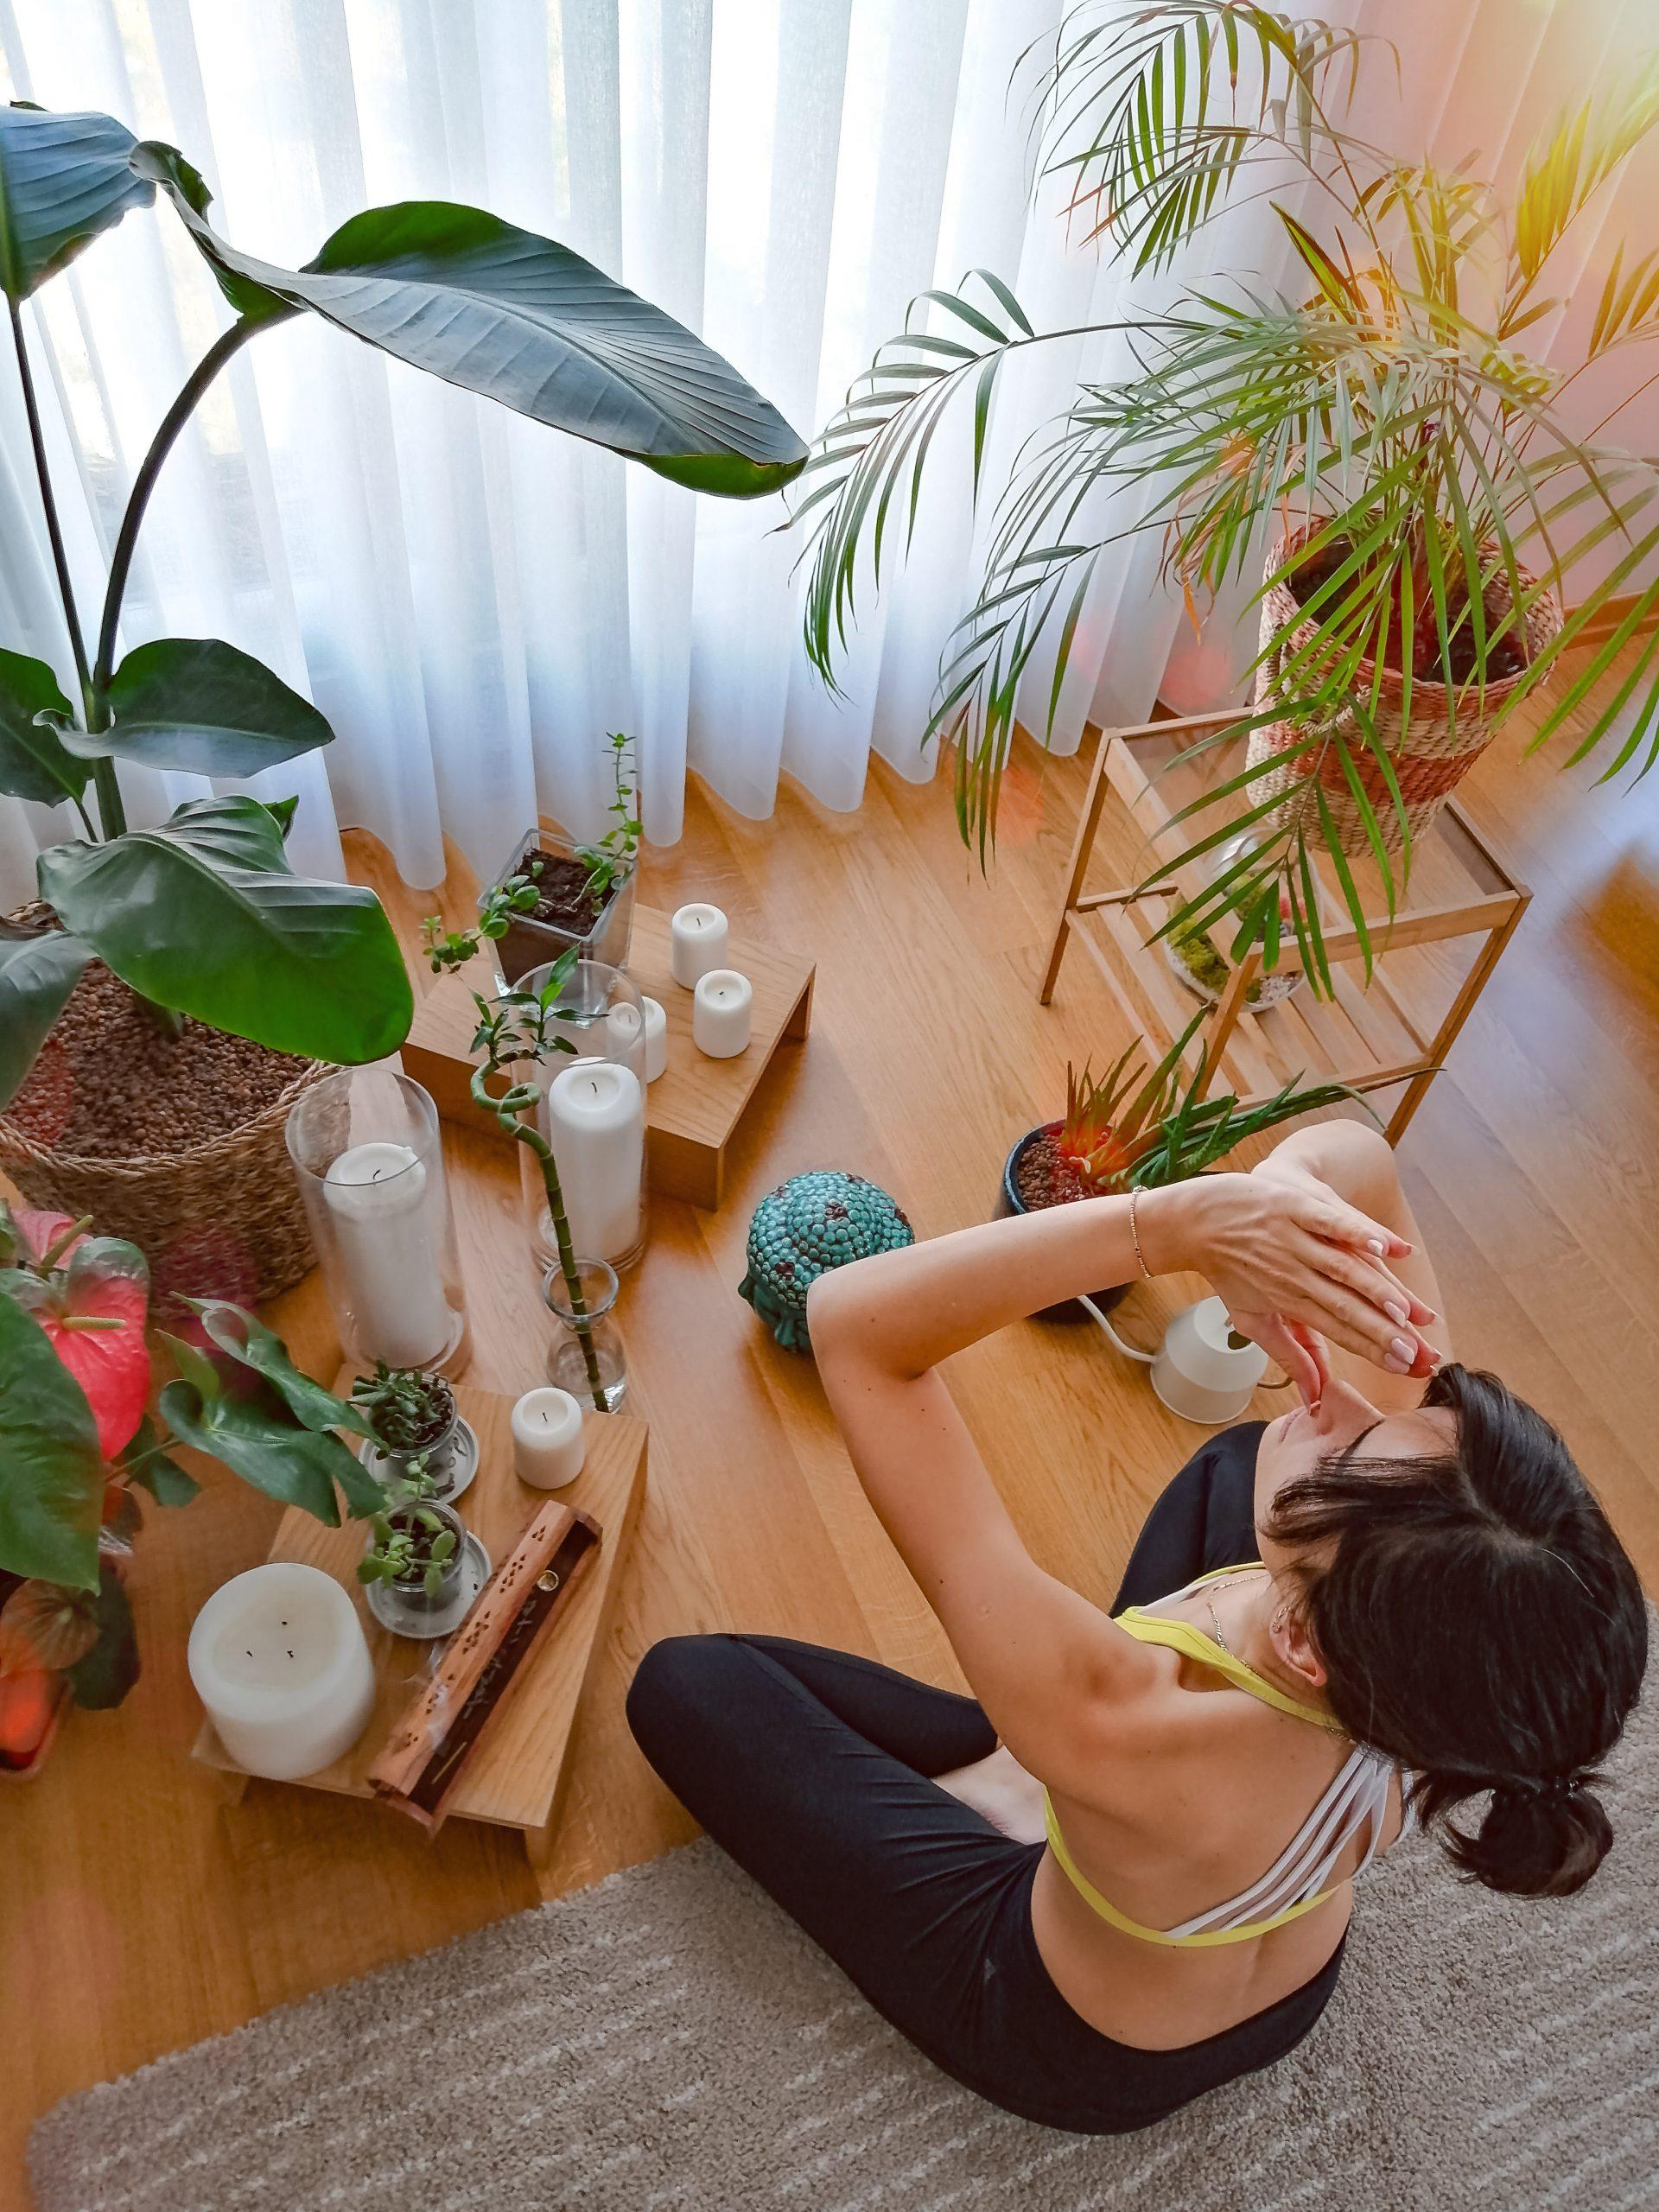 yoga instagram hesaplari